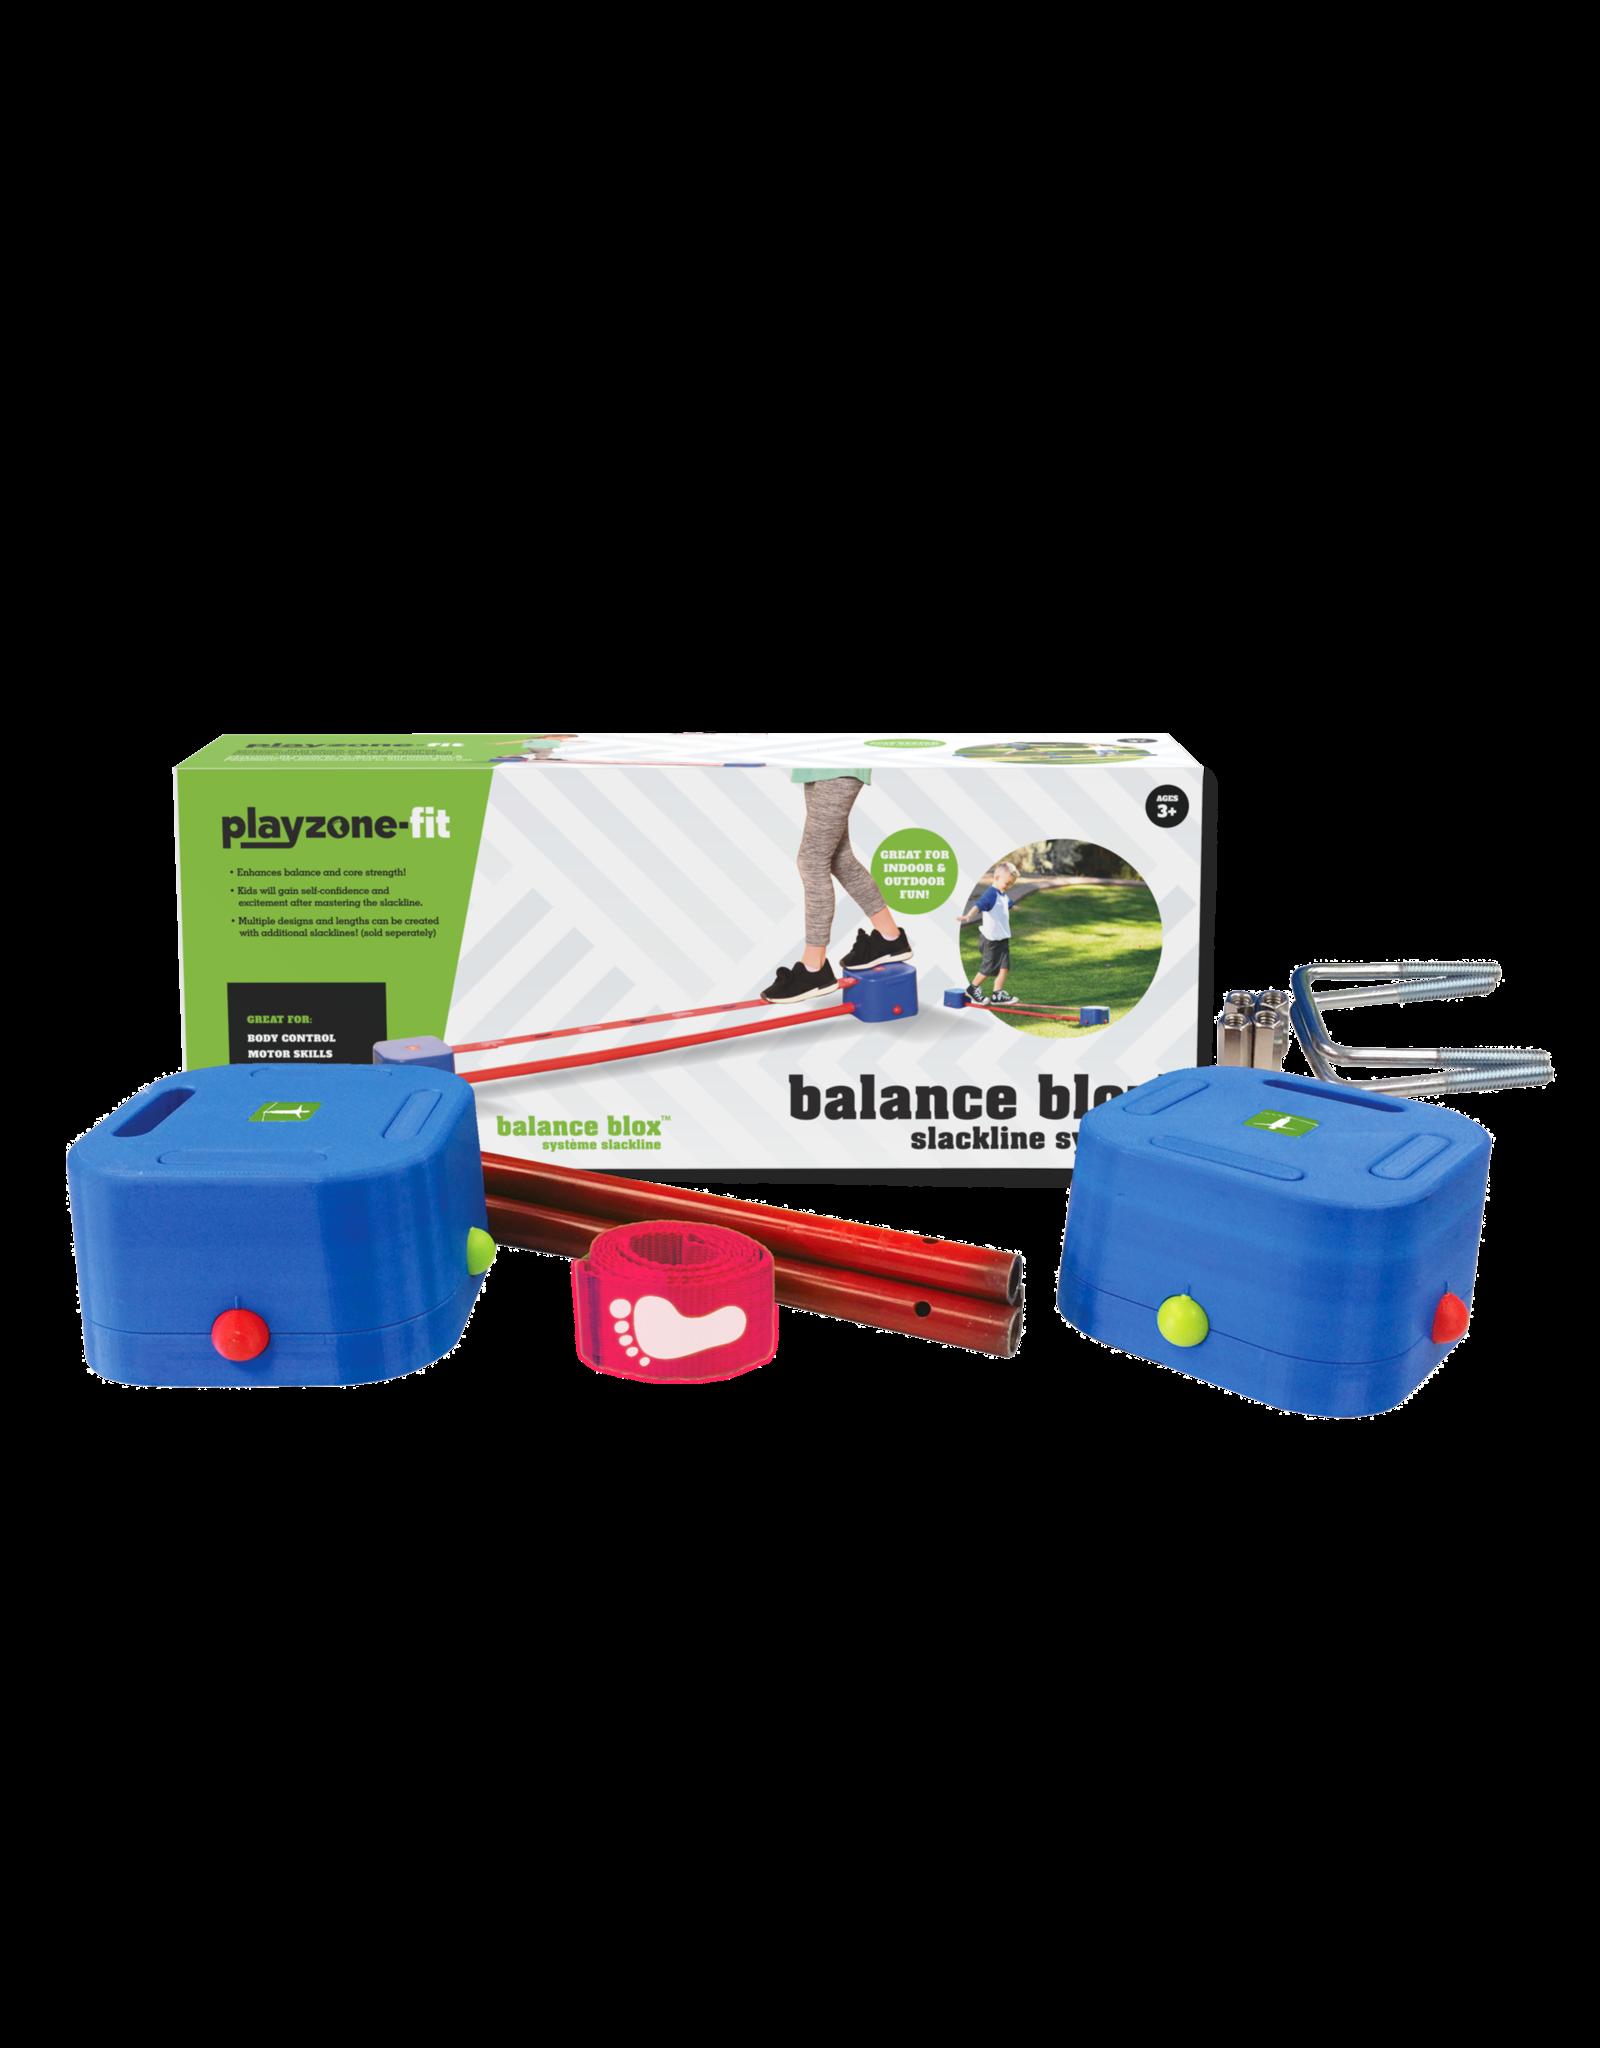 B4Adventure Balance Blox Slackline Kit